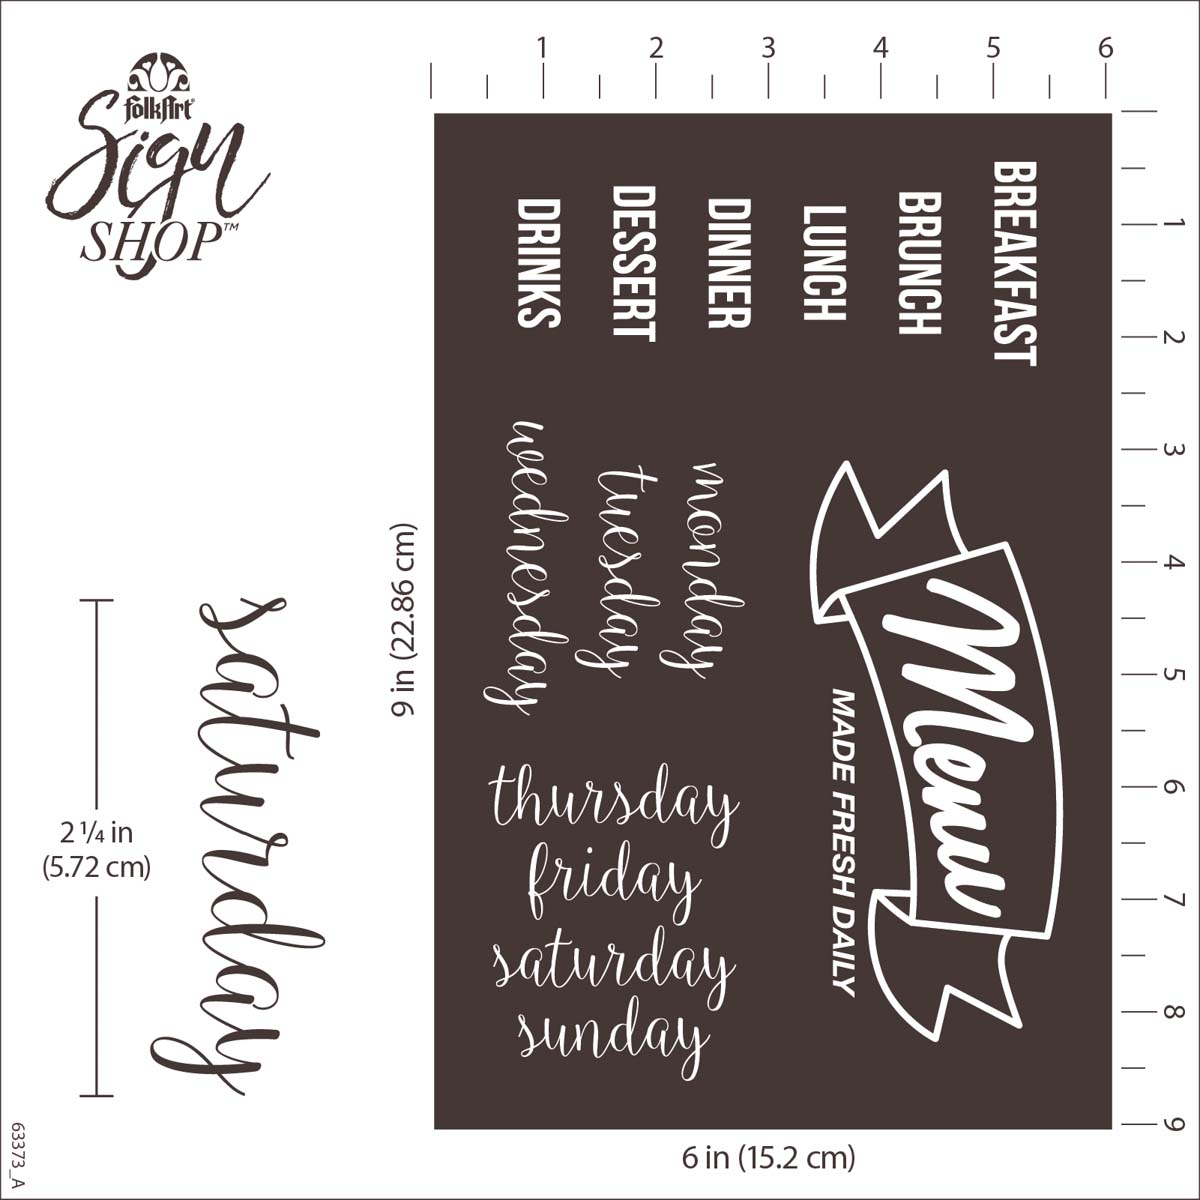 FolkArt ® Sign Shop™ Mesh Stencil - Good Food, 2 pc. - 63373